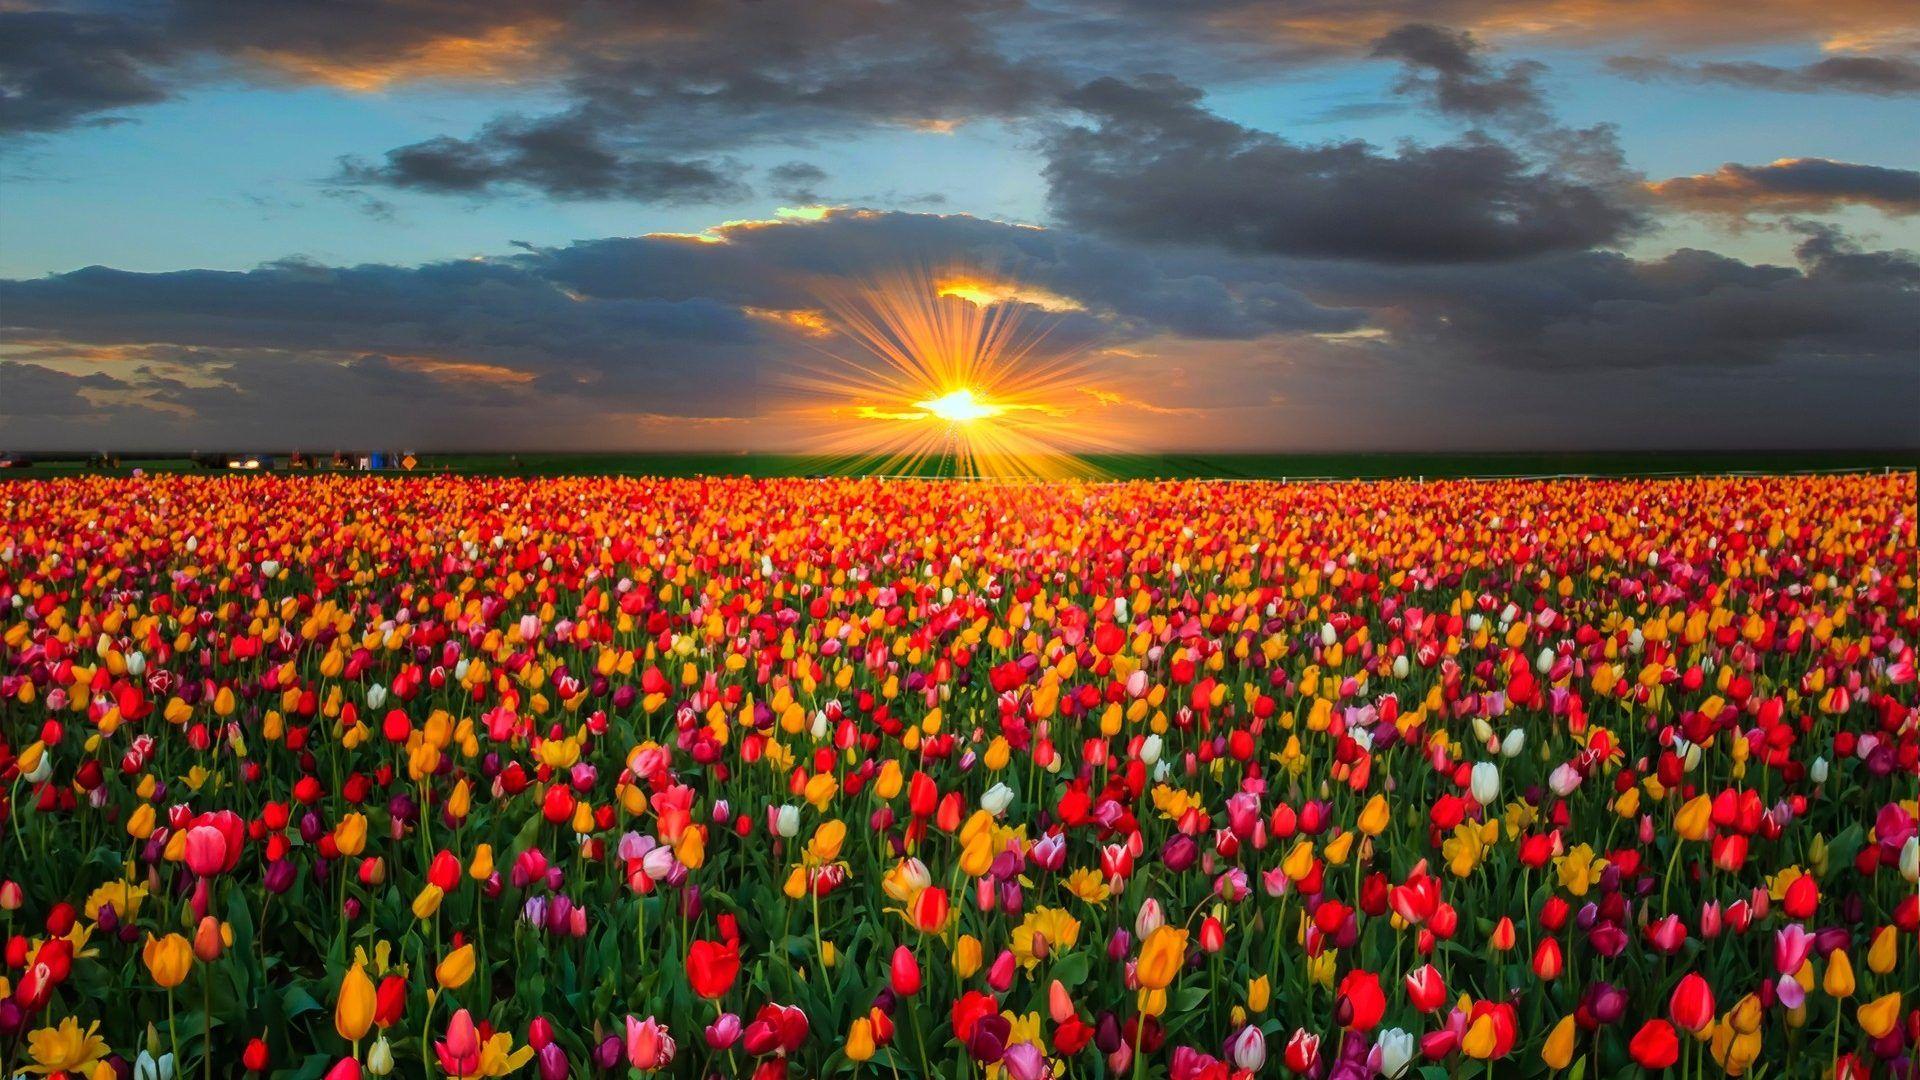 Spring Flowers Tulips Field Sunrise Grass Clouds: Last Moments Warmth Kemc Wooden Shoe Tulip Farm Oregon